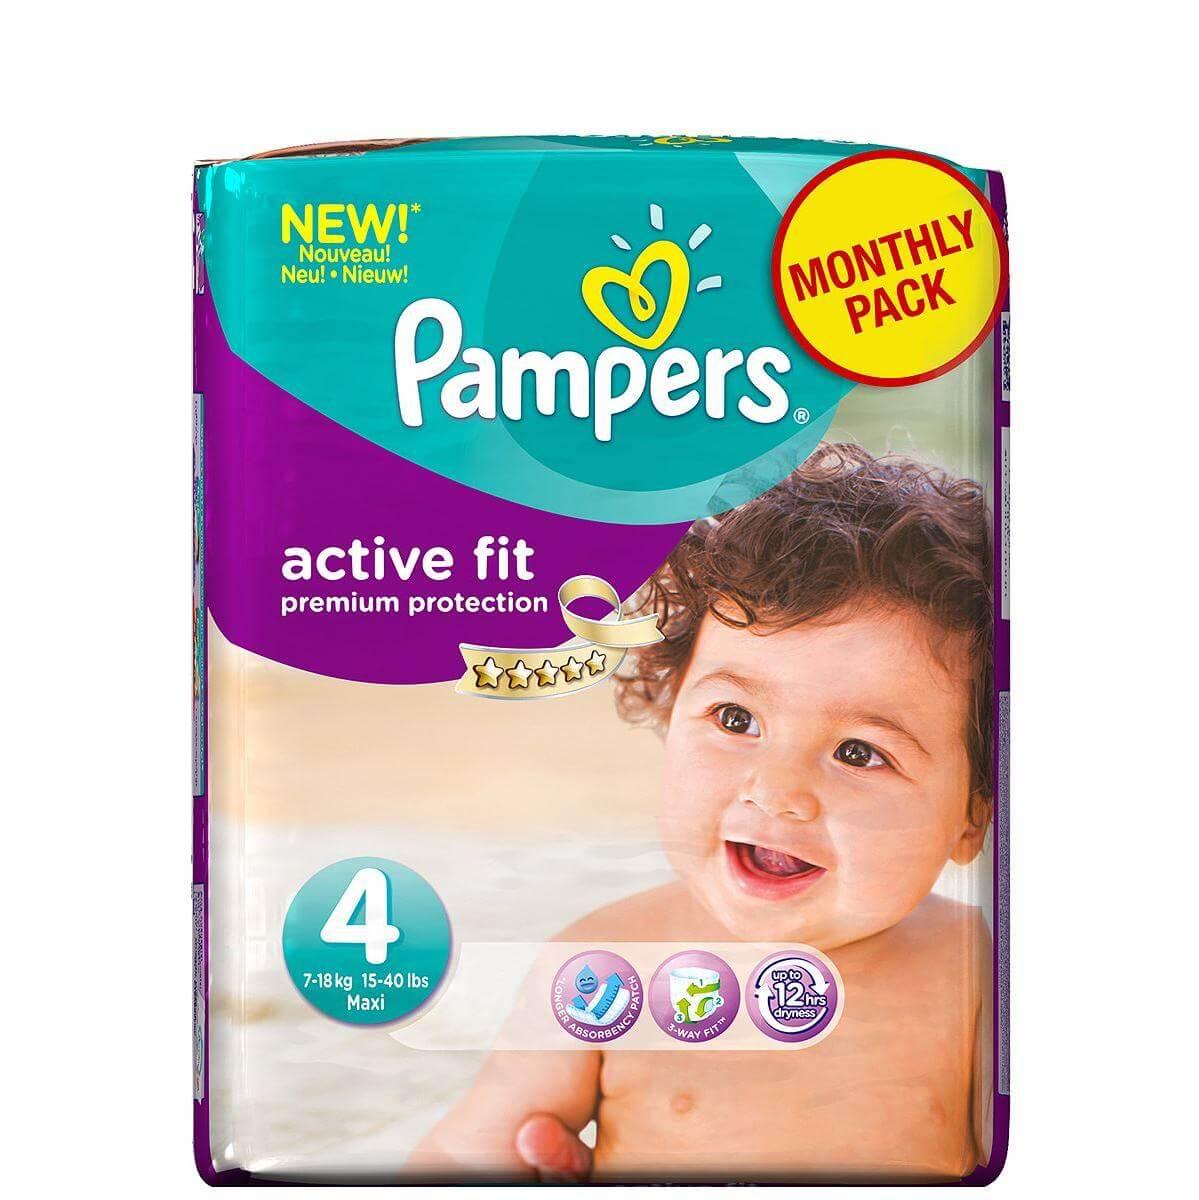 Pampers Active Fit Maxi No. 4 (8-16 kg) Monthly Pack, 168 τμχ, μόνο 0,29€/πάνα μητέρα παιδί   περιποίηση για το μωρό   πάνες